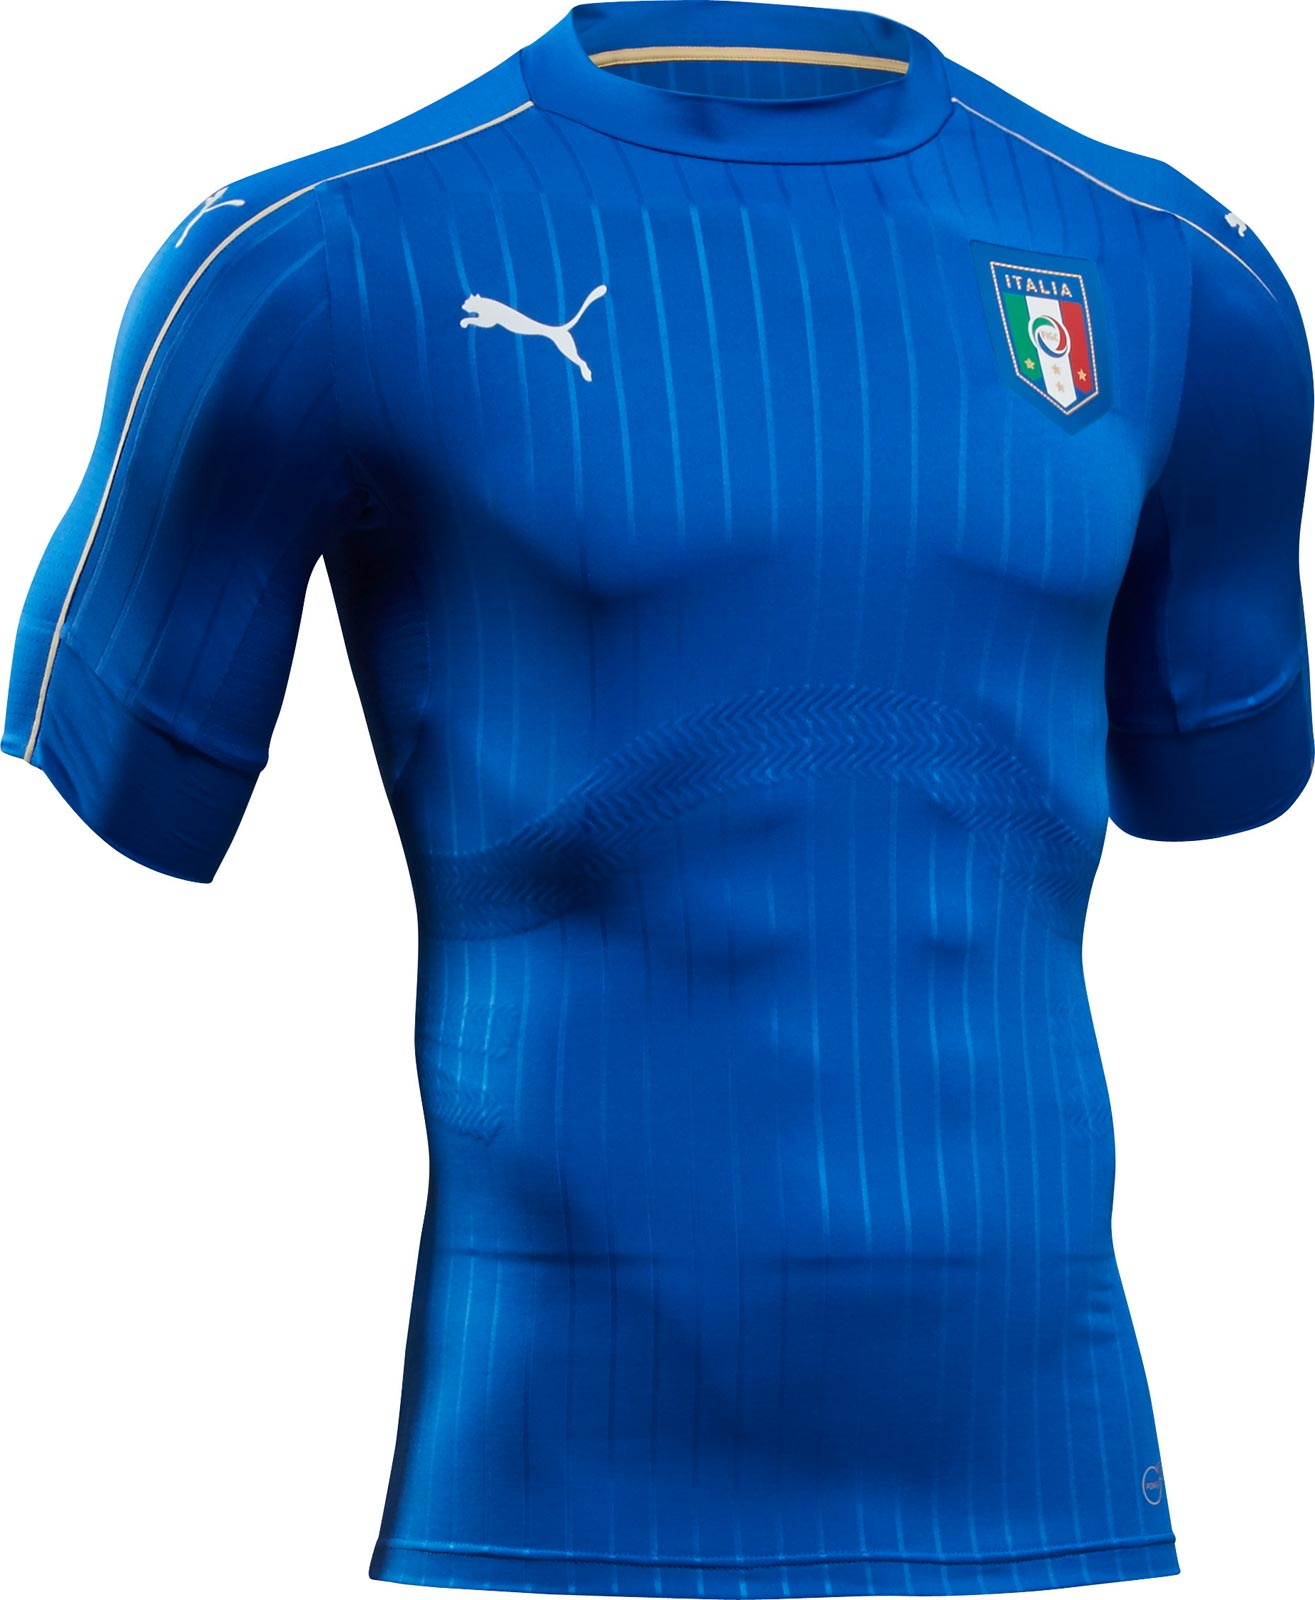 Puma italy euro 2016 kit released footy headlines for Italian kit